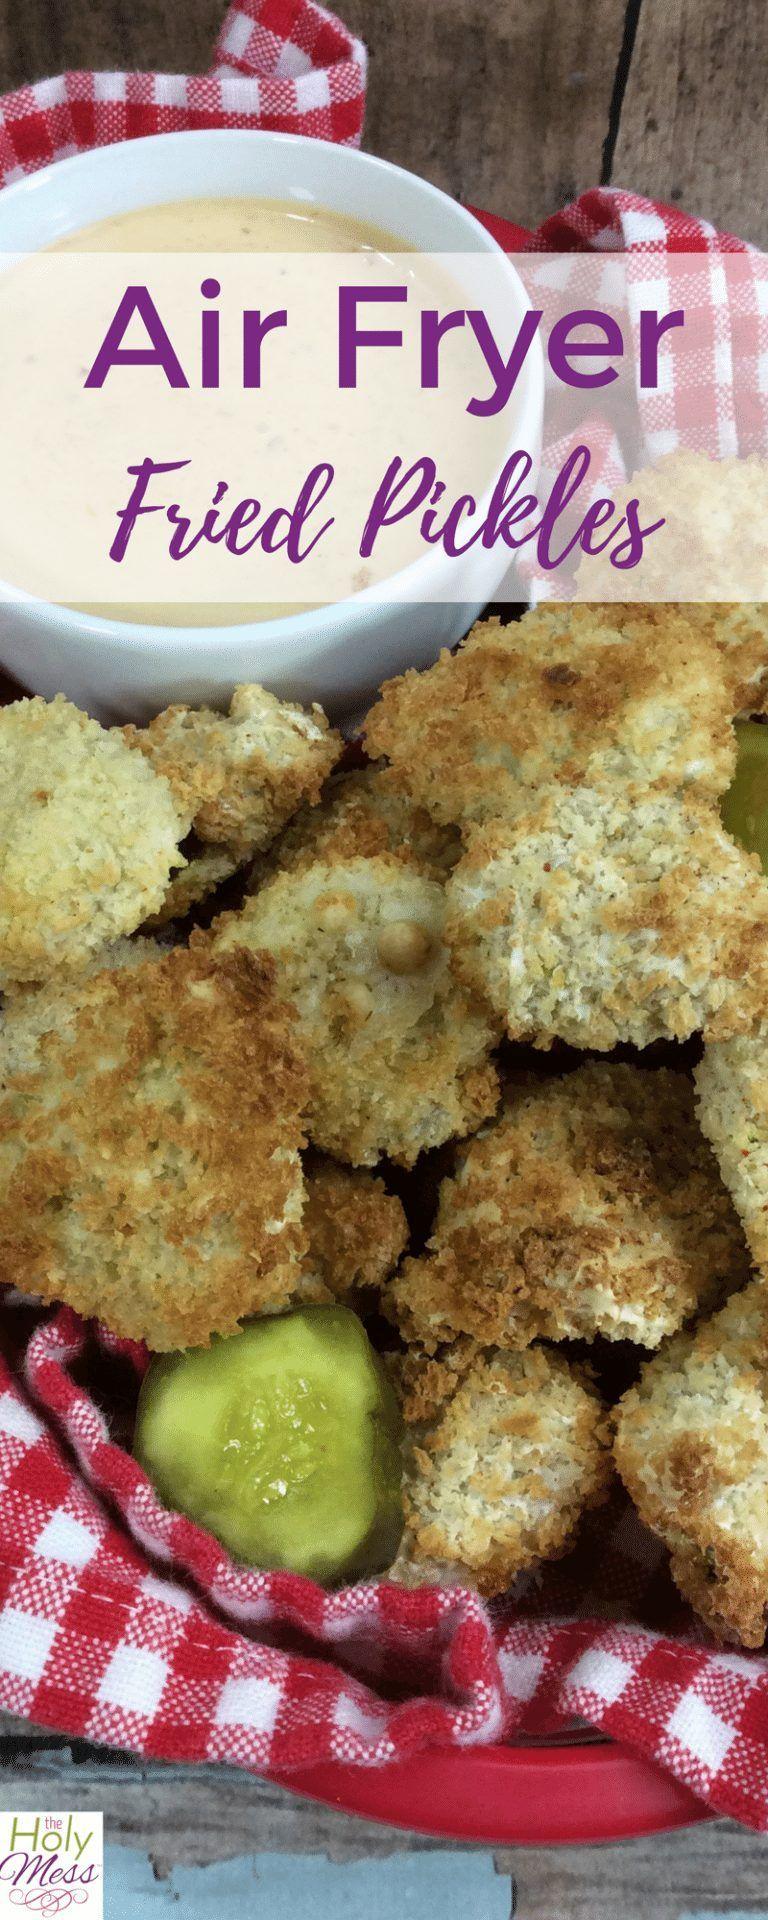 air fryer Air Fryer Fried Pickles Air fryer recipes, Ww